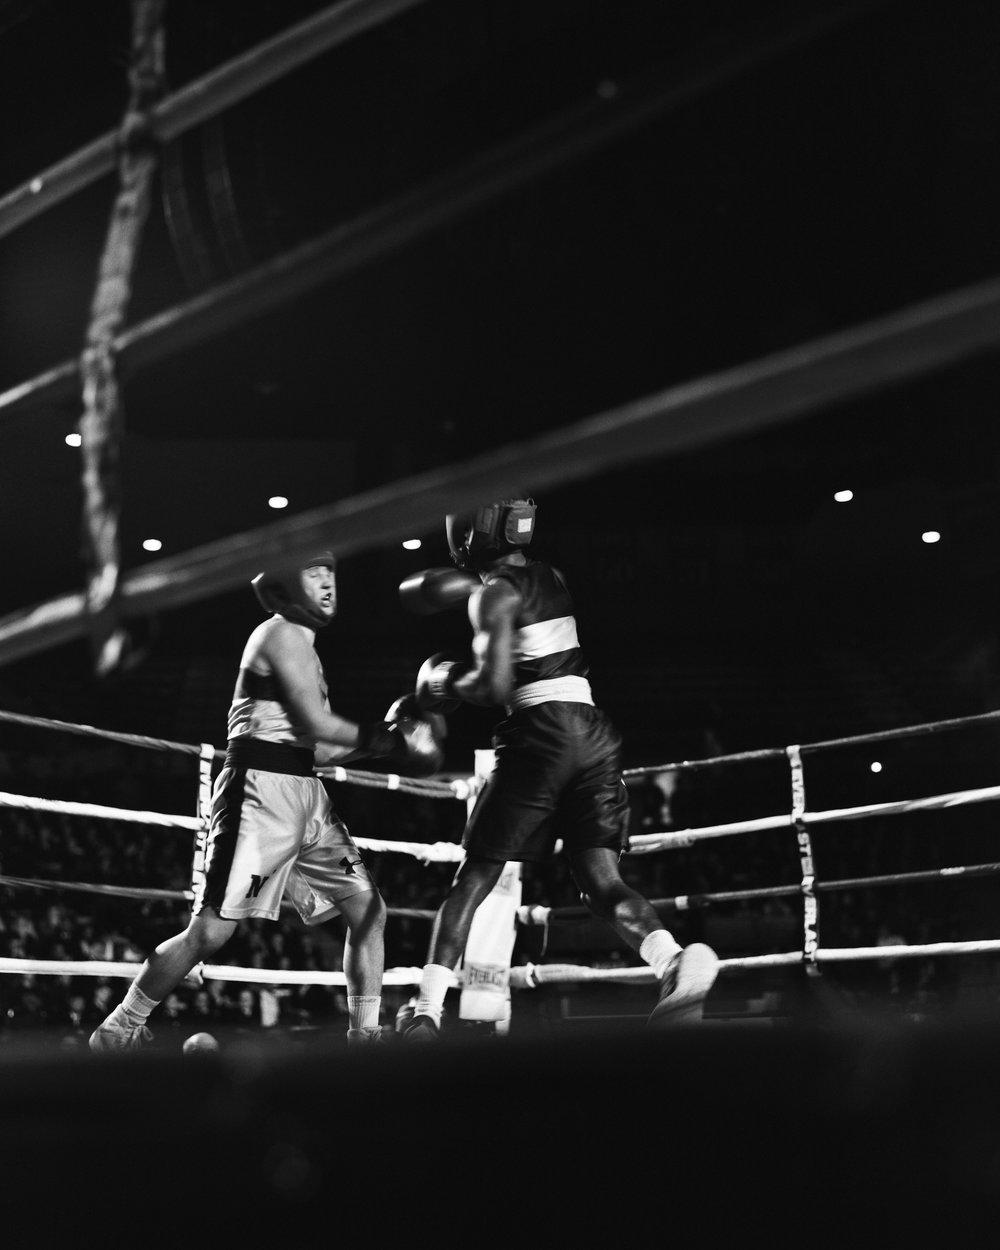 Boxing-12.jpg